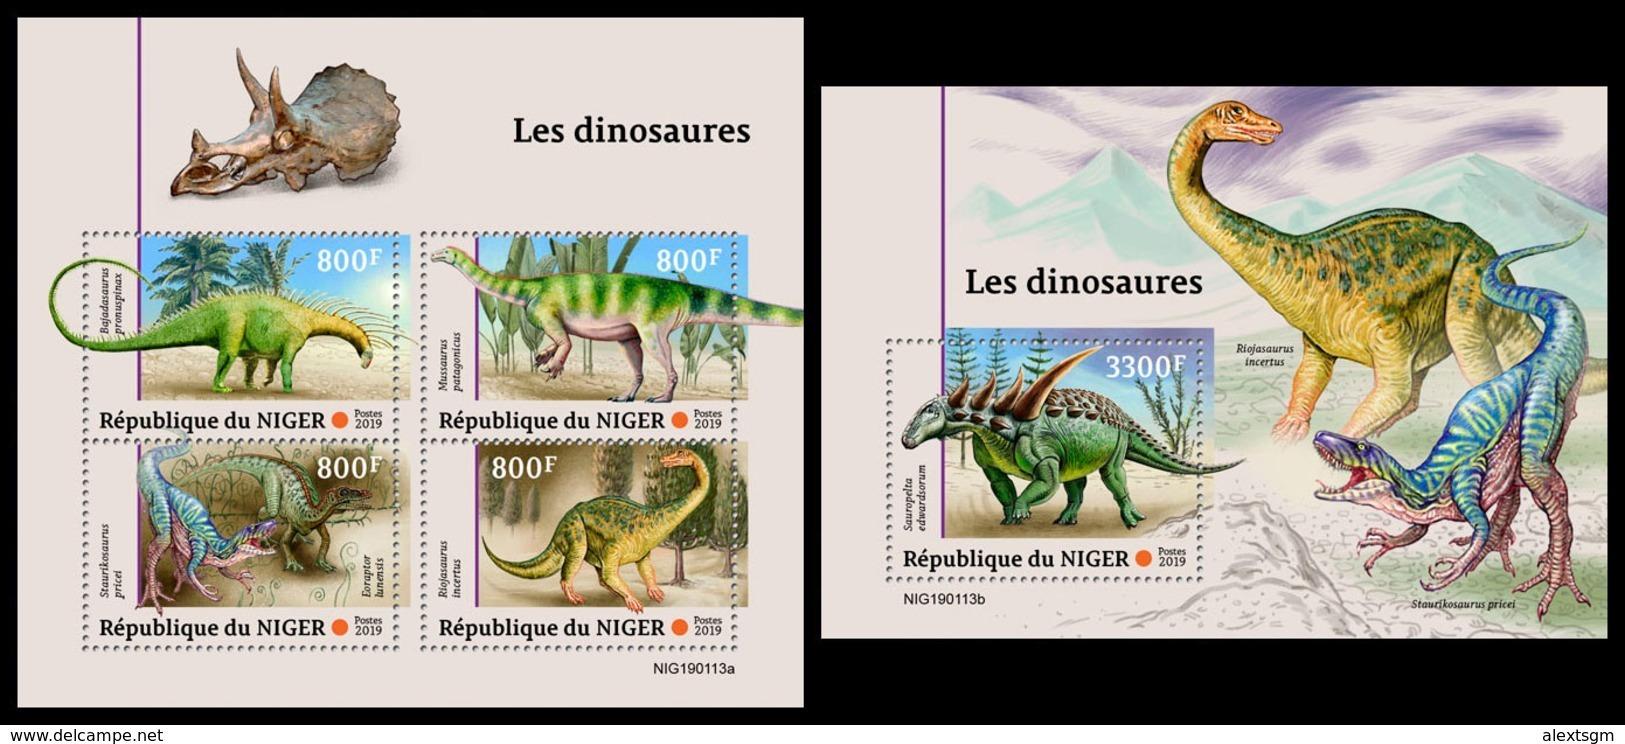 NIGER 2019 - Dinosaurs, M/S + S/S. Official Issue - Prehistorisch